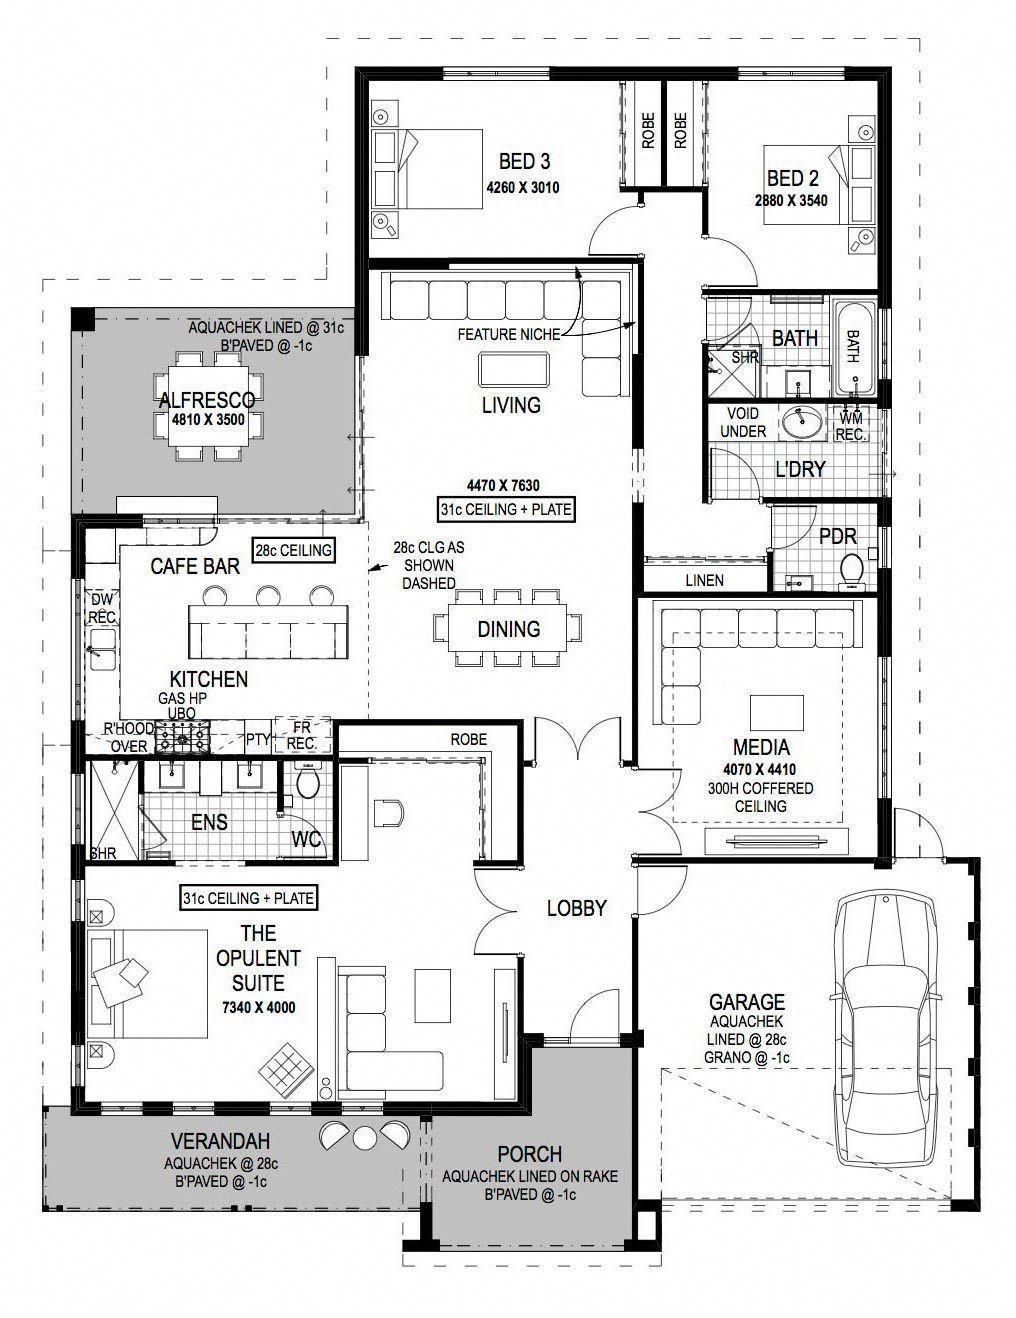 Luxury Home Builders Perth Wa Luxury Homes Designs Impressions Soshomedecor Luxury House Designs House Plans Australia Luxury House Plans